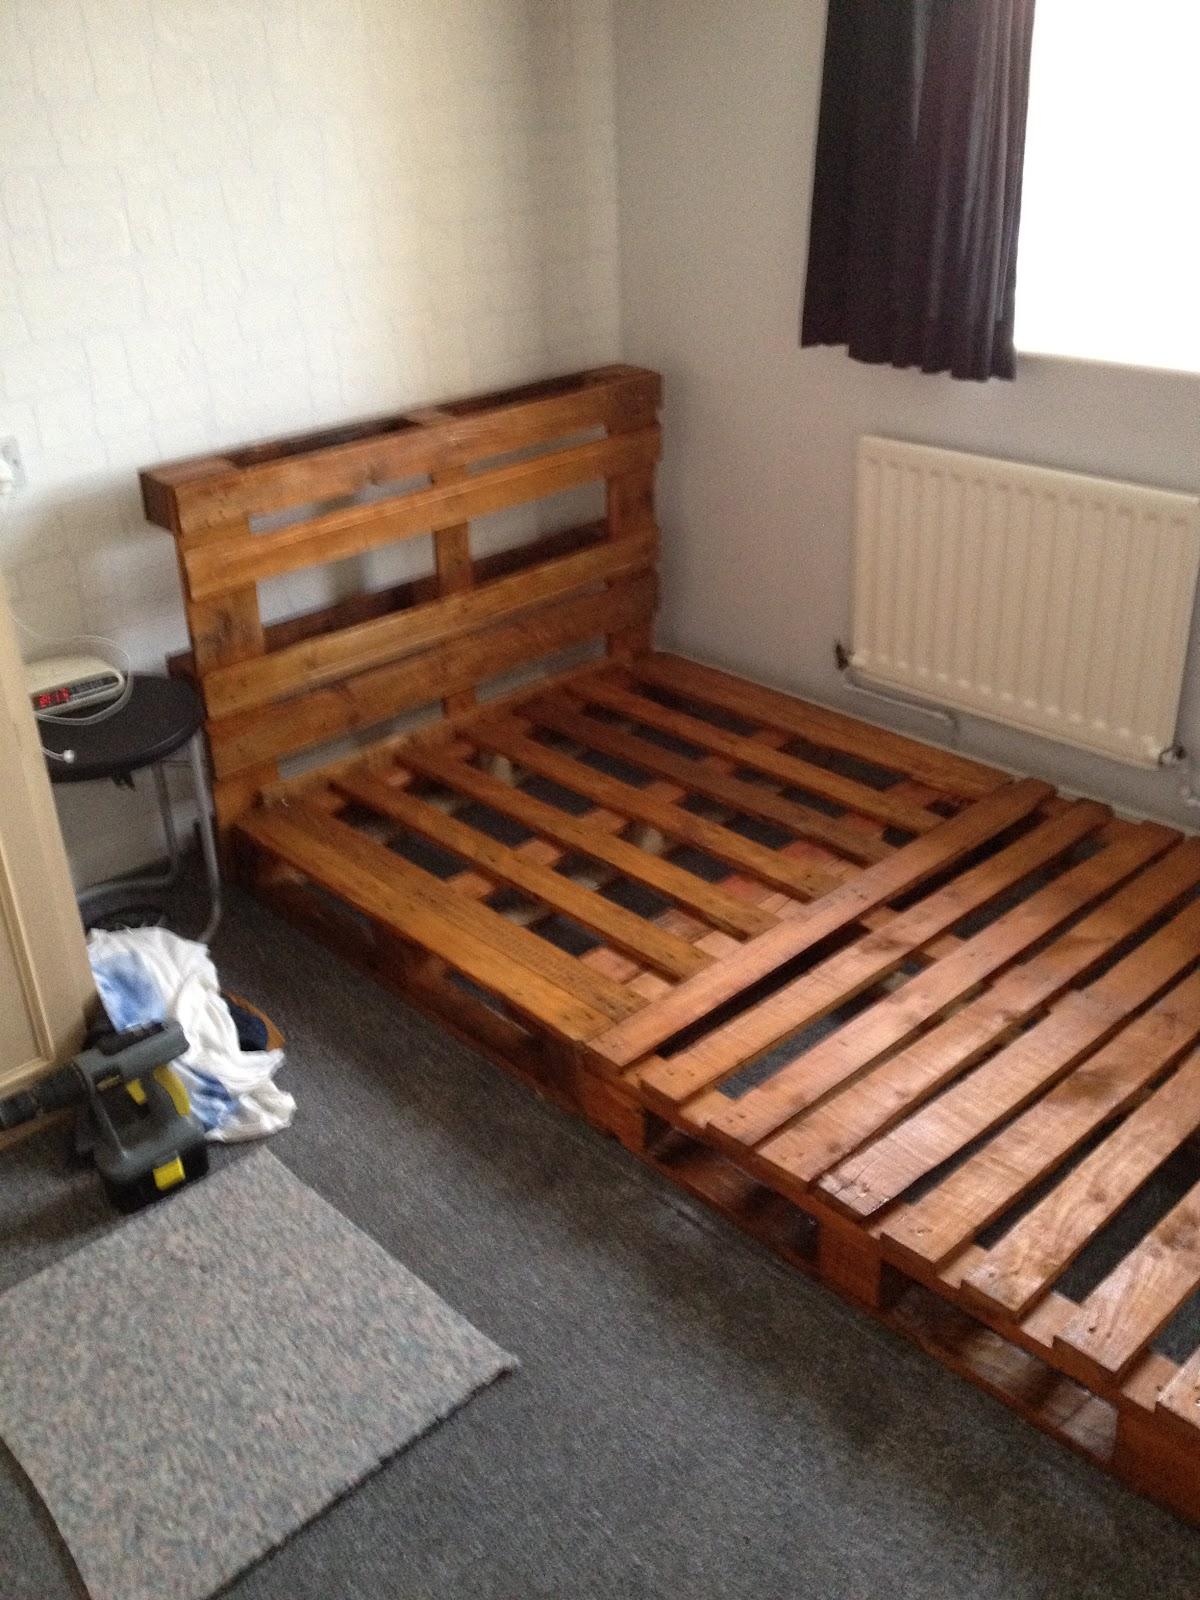 notinabox: DIY Pallet Bed